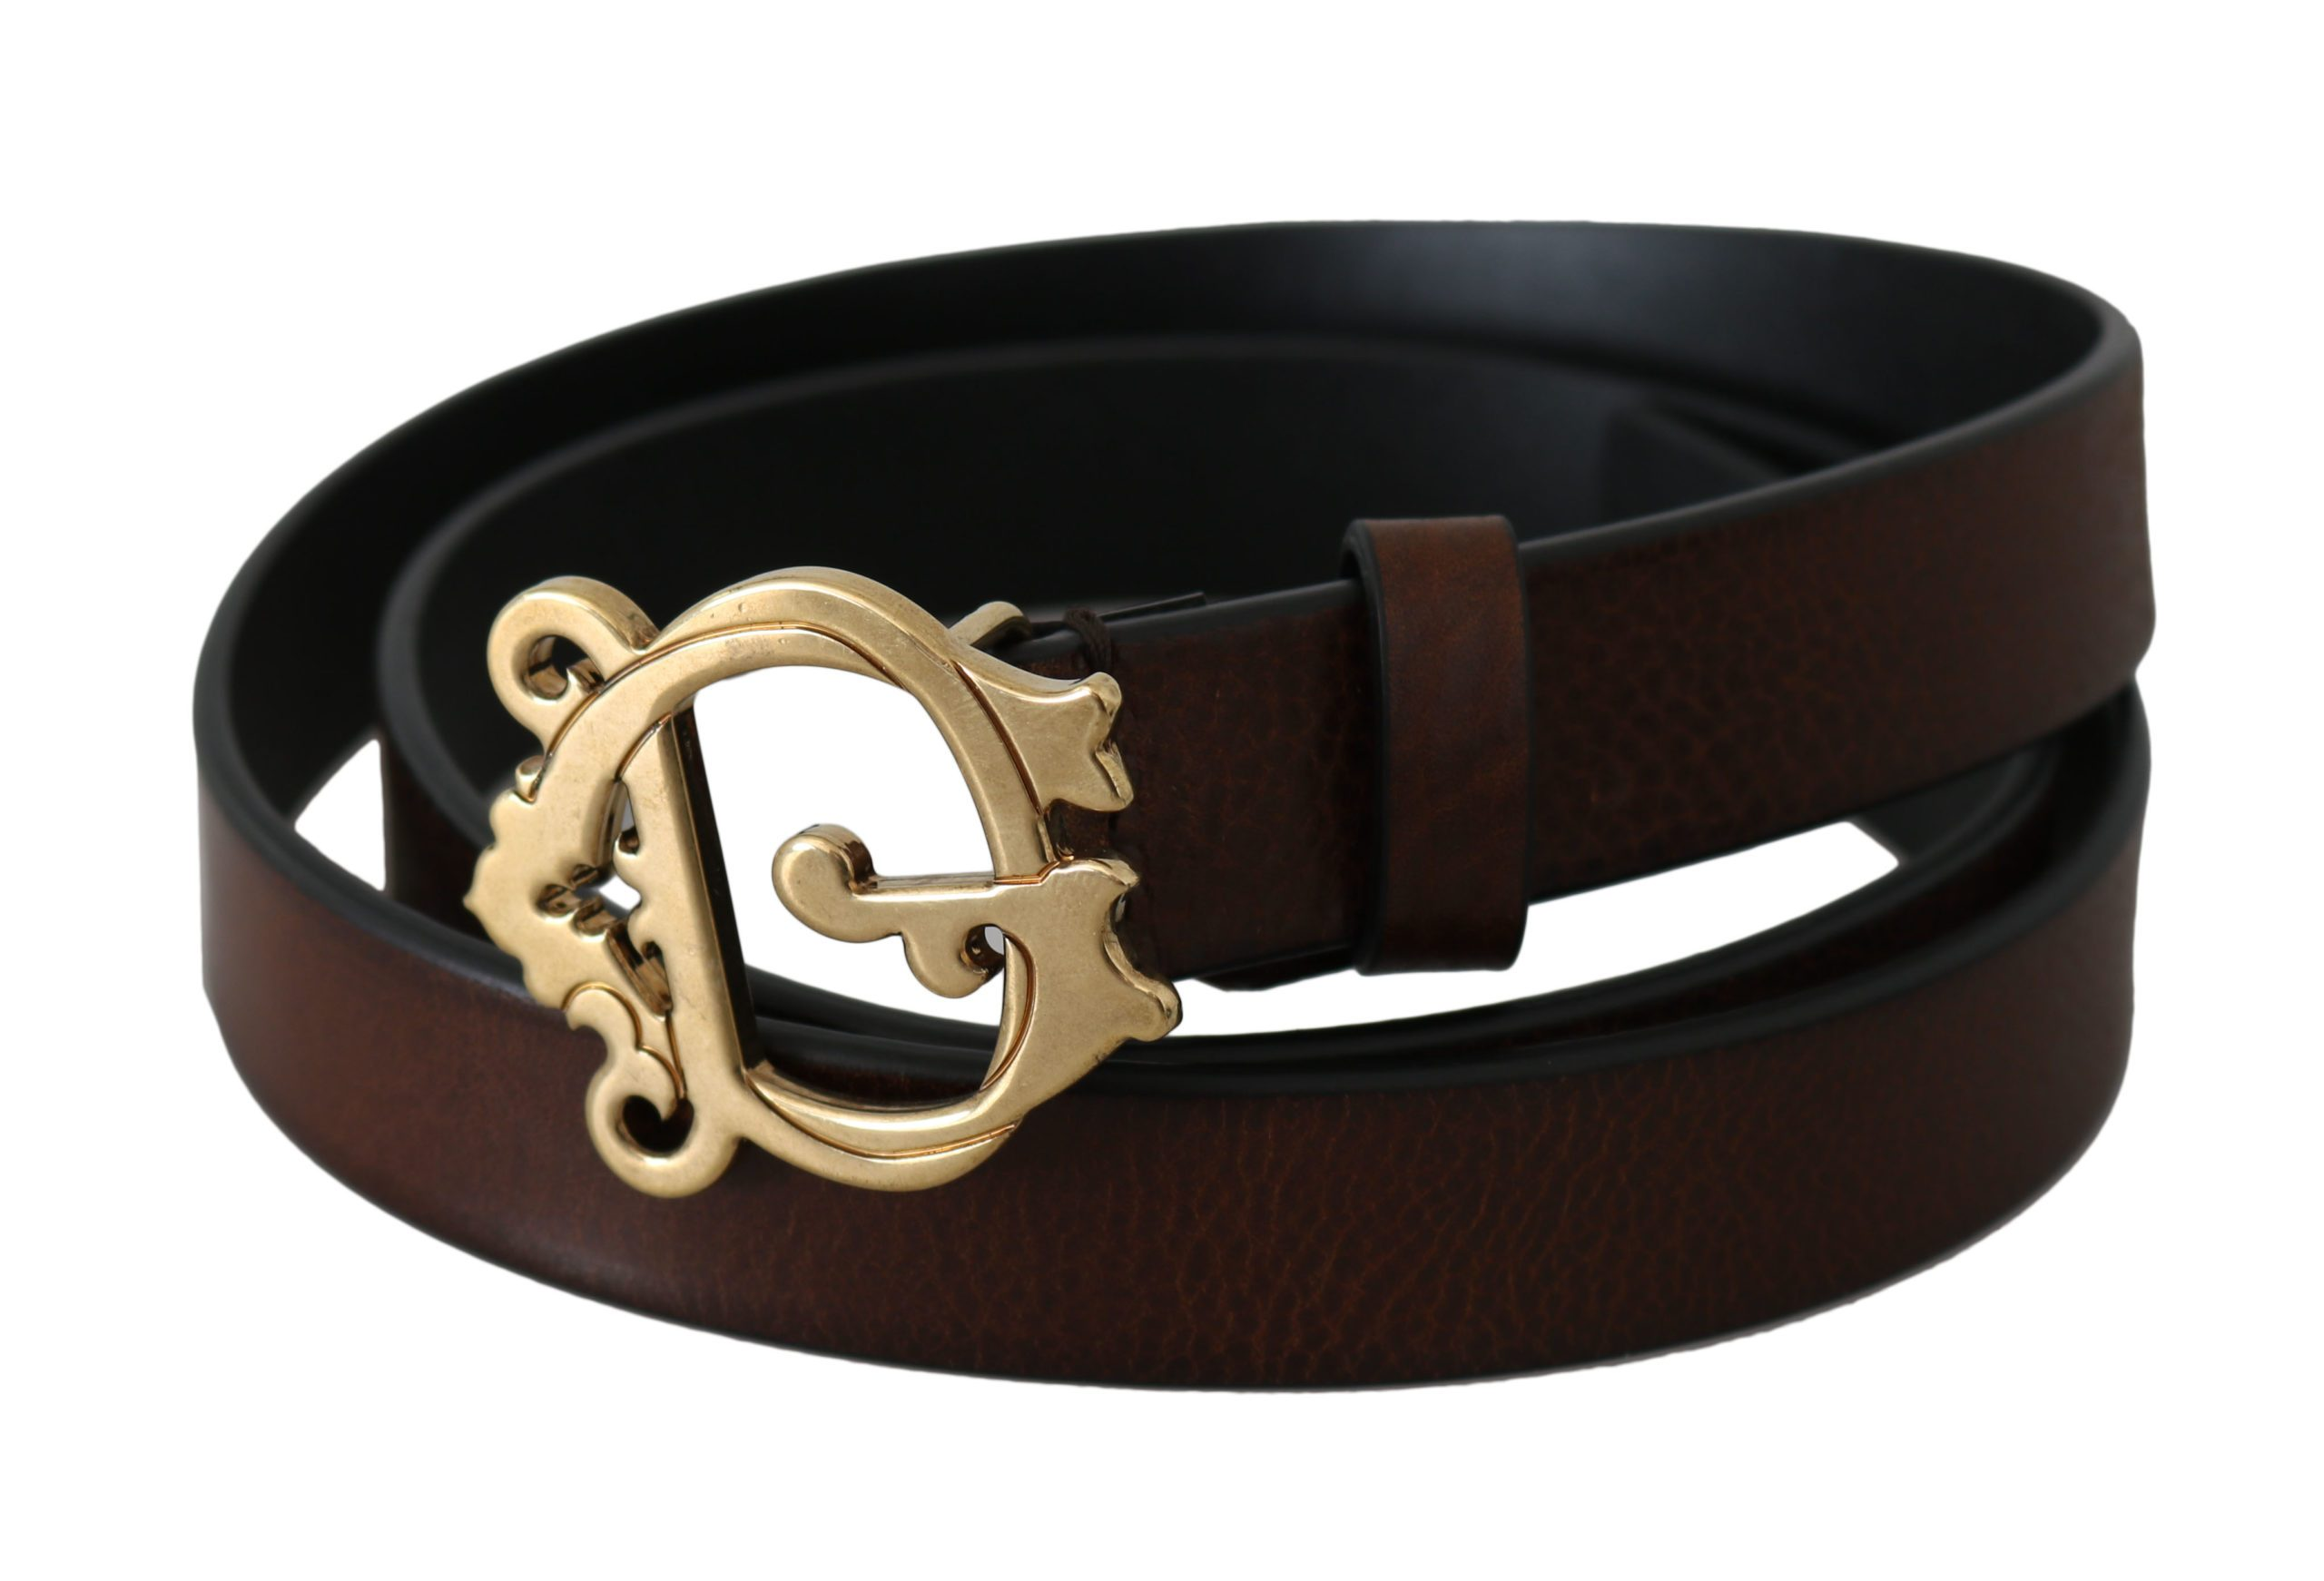 Dolce & Gabbana Women's Leather Buckle Belt Brown BEL60817 - 90 cm / 36 Inches